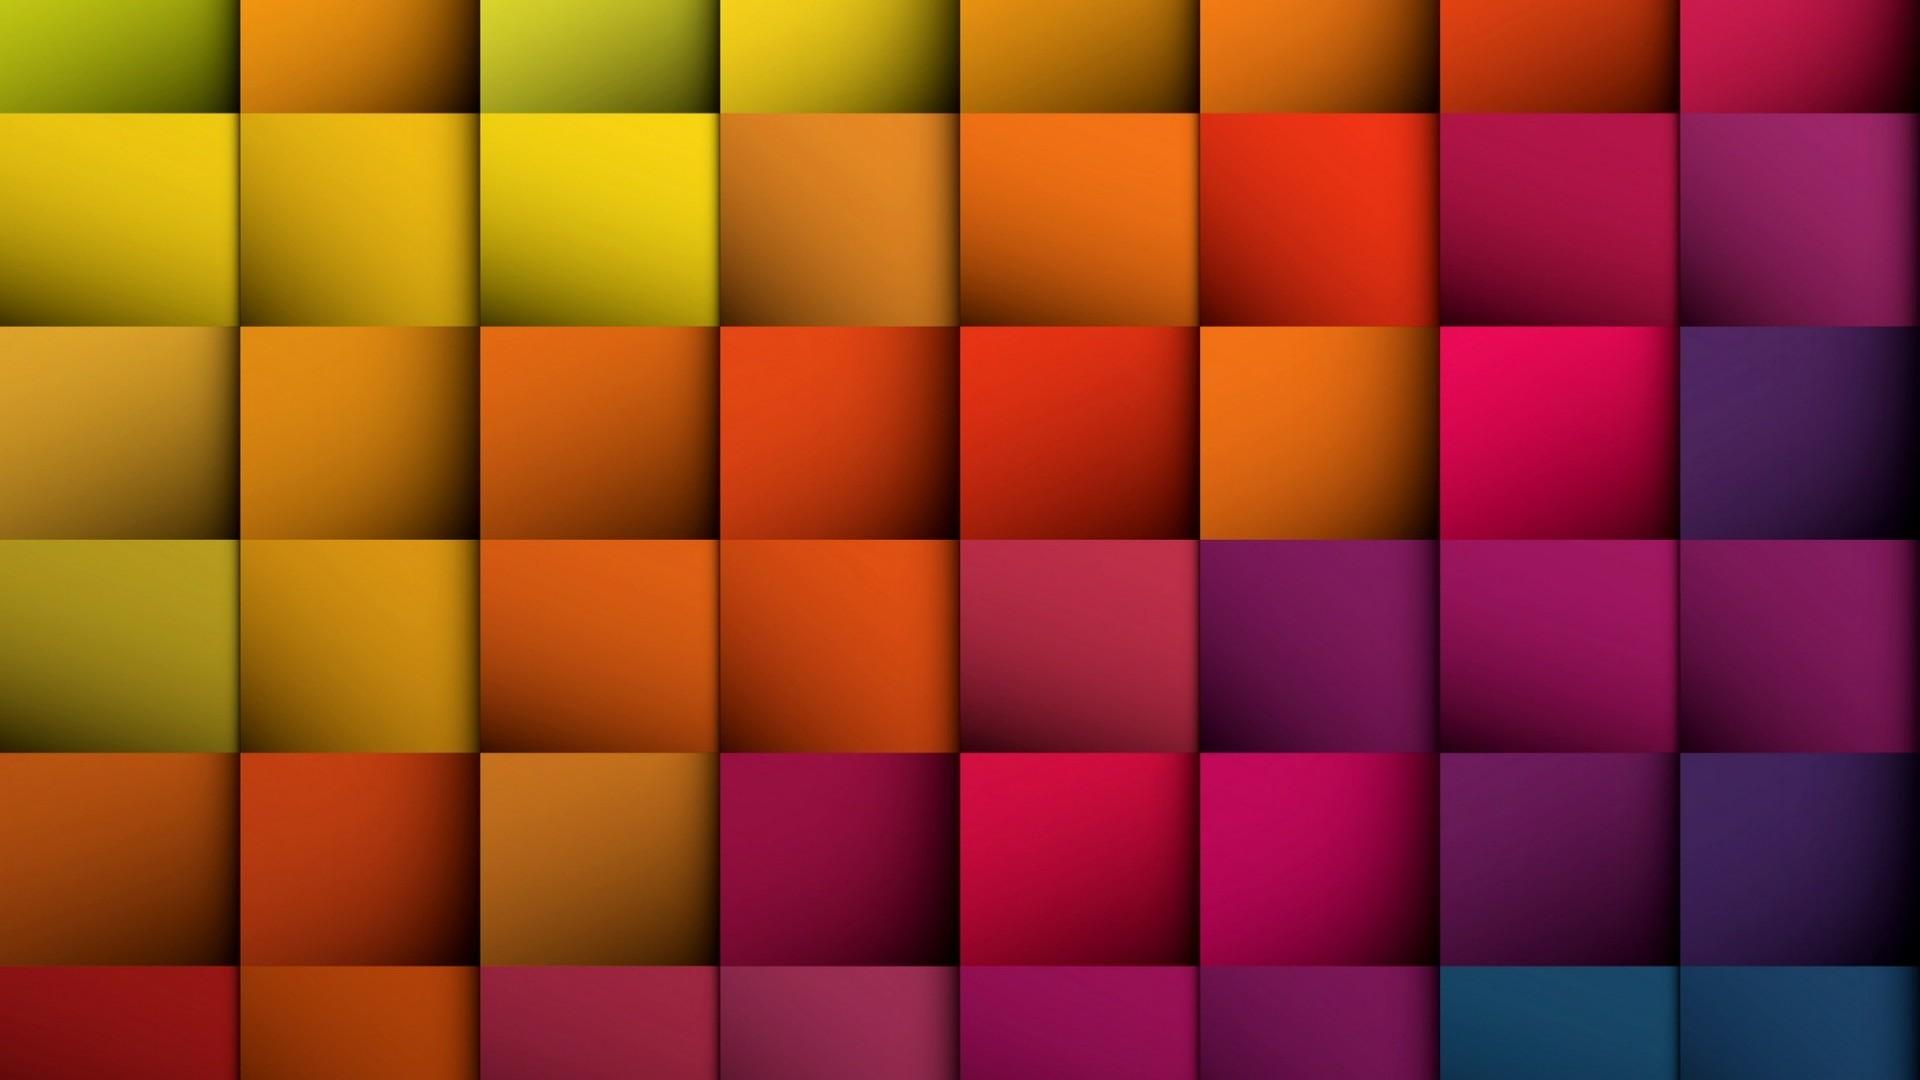 color wallpaper ·① download free cool hd backgrounds for desktop